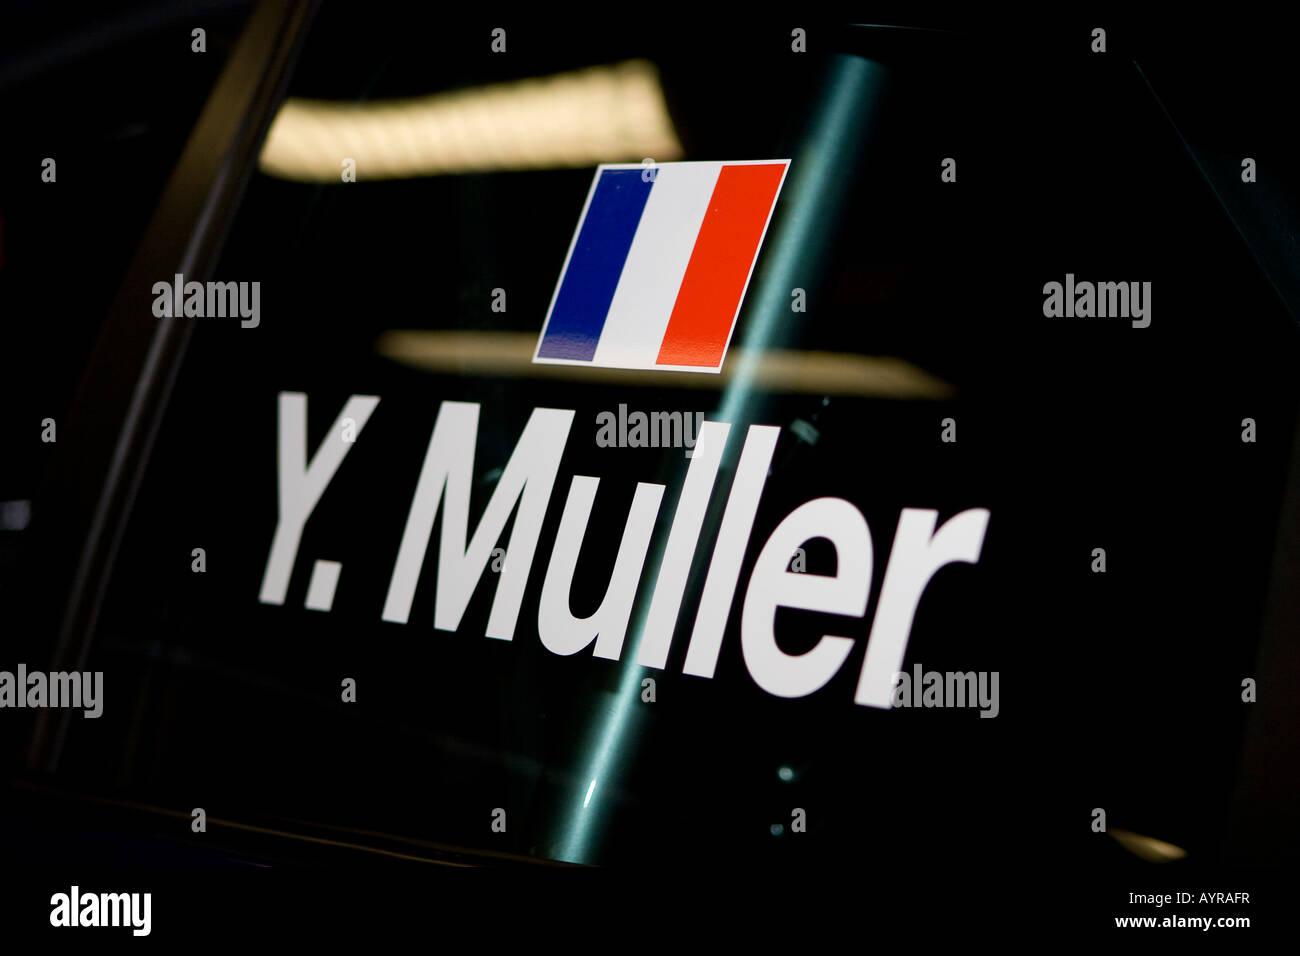 Yvan Muller's race car - Stock Image